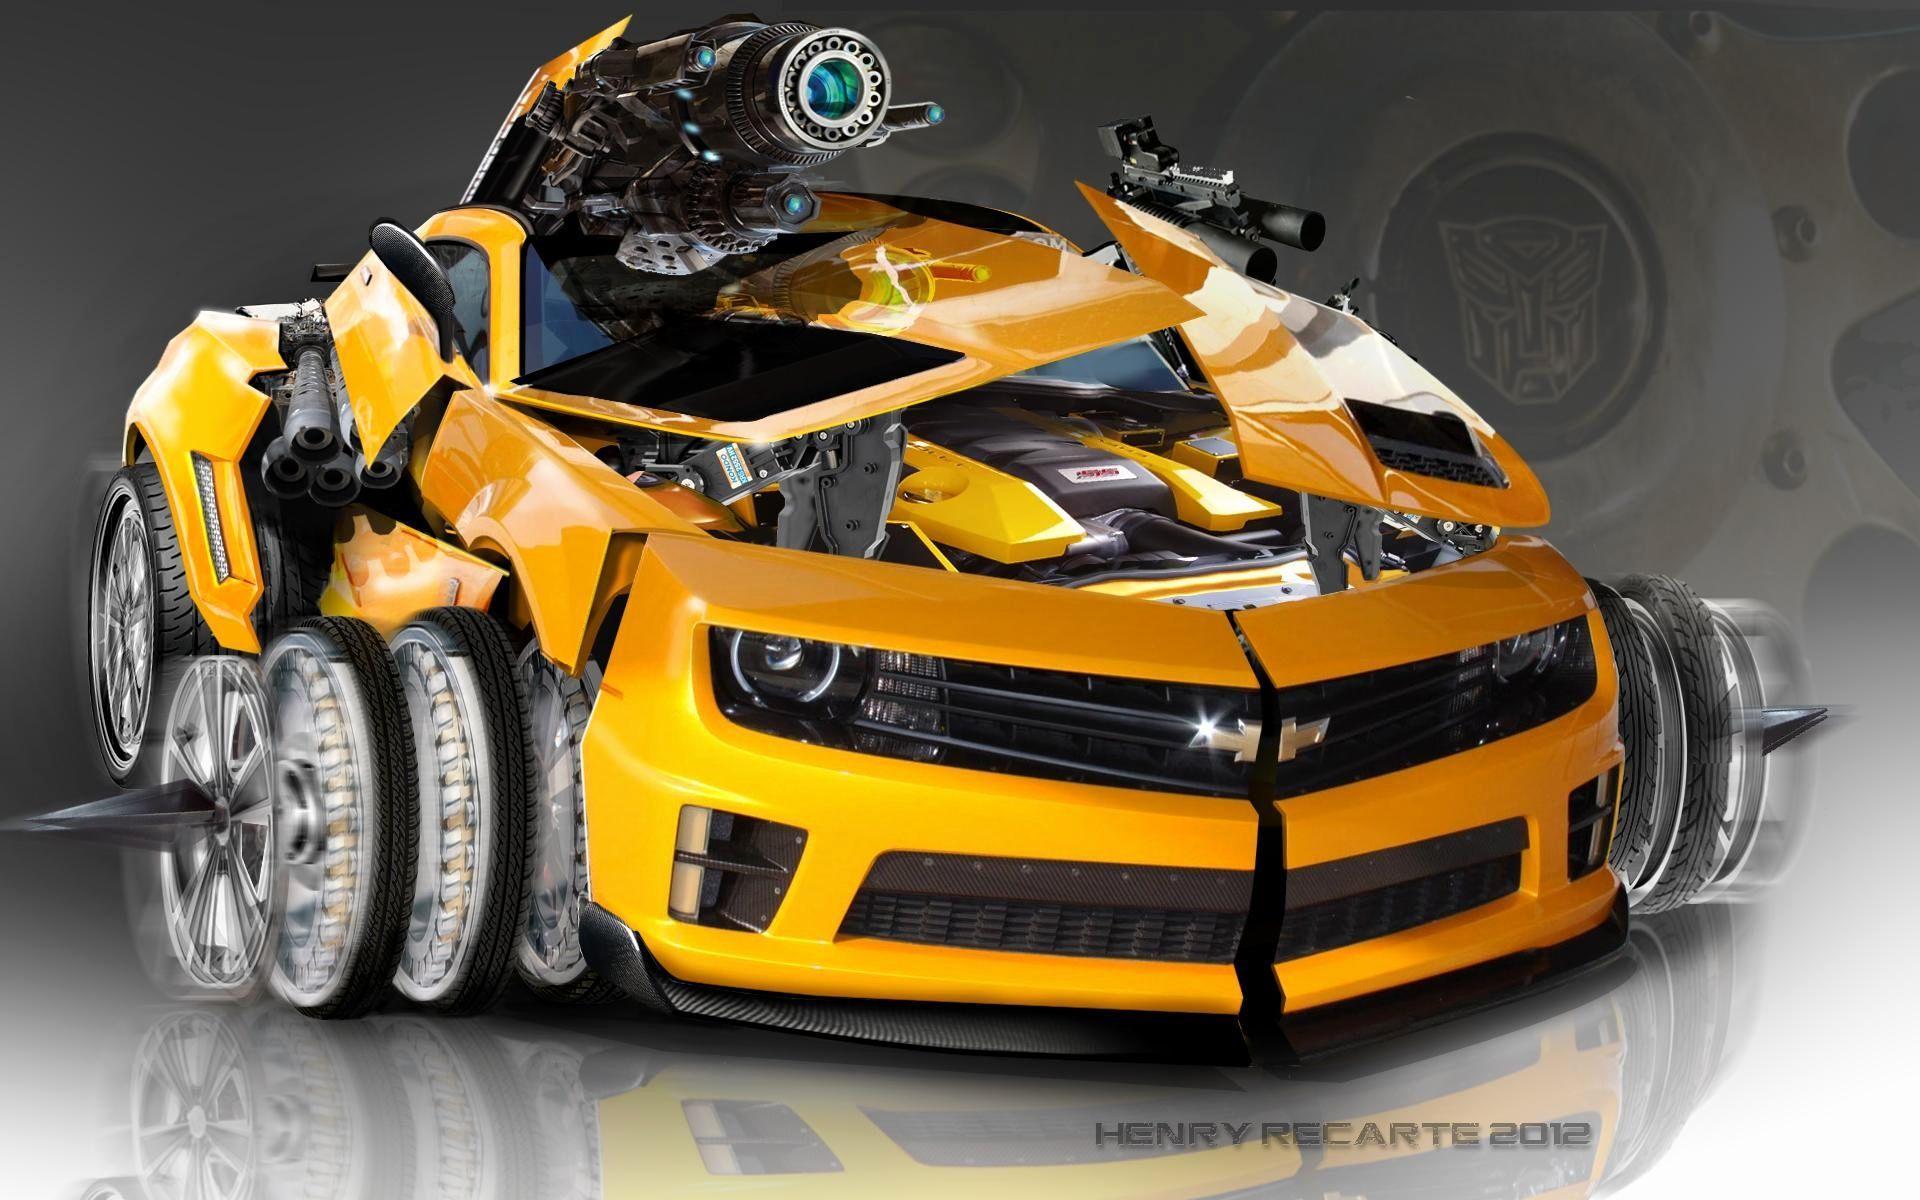 Bumblebee Camaro Wallpapers Top Free Bumblebee Camaro Backgrounds